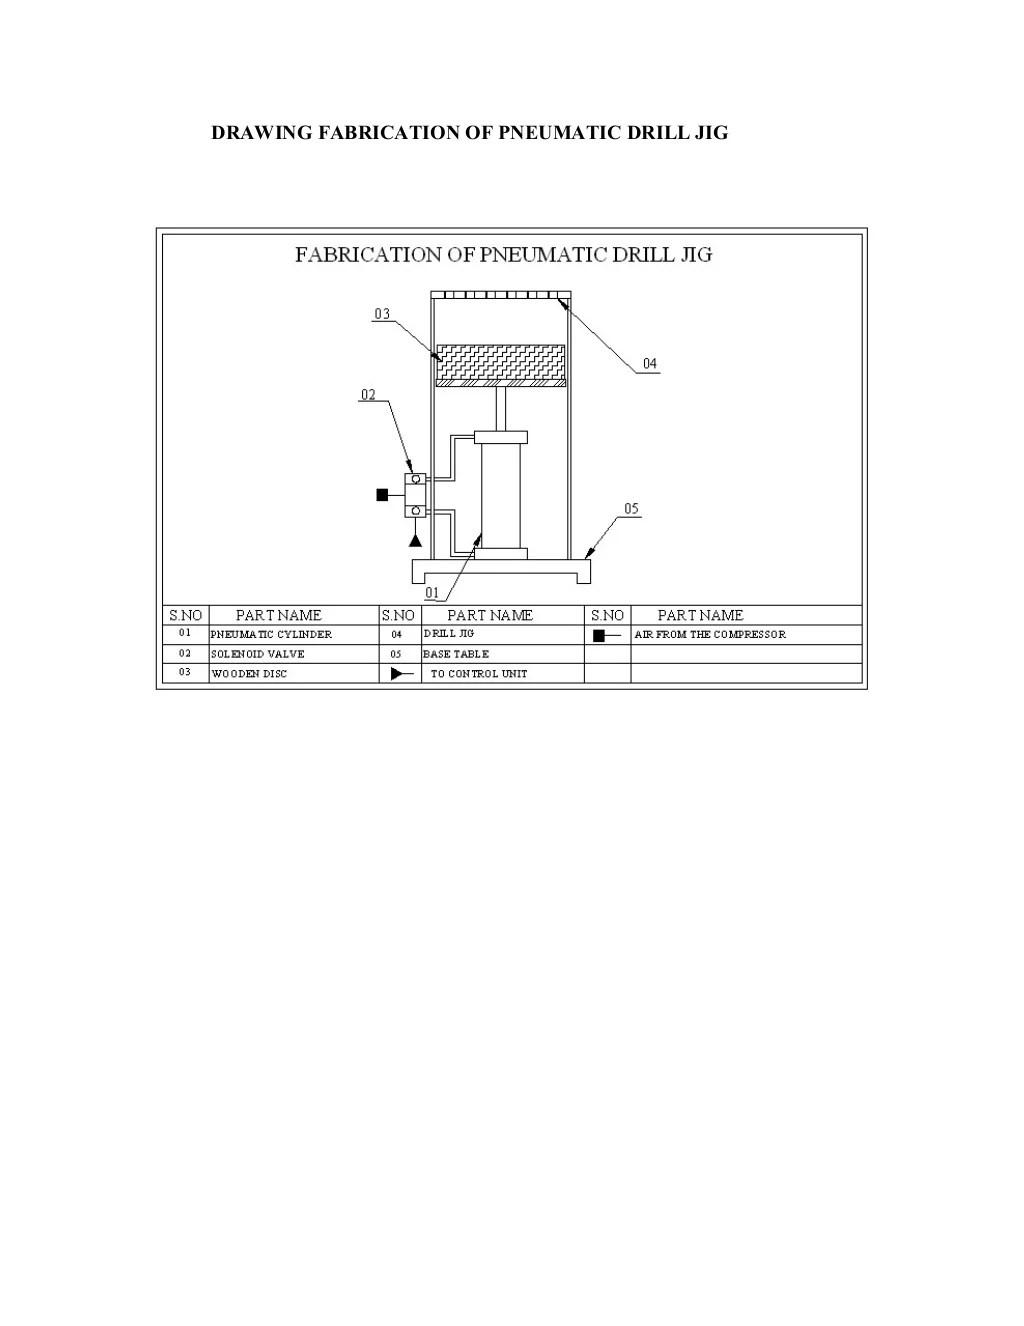 Et Fabrication Of Pneumatic Drill Jig